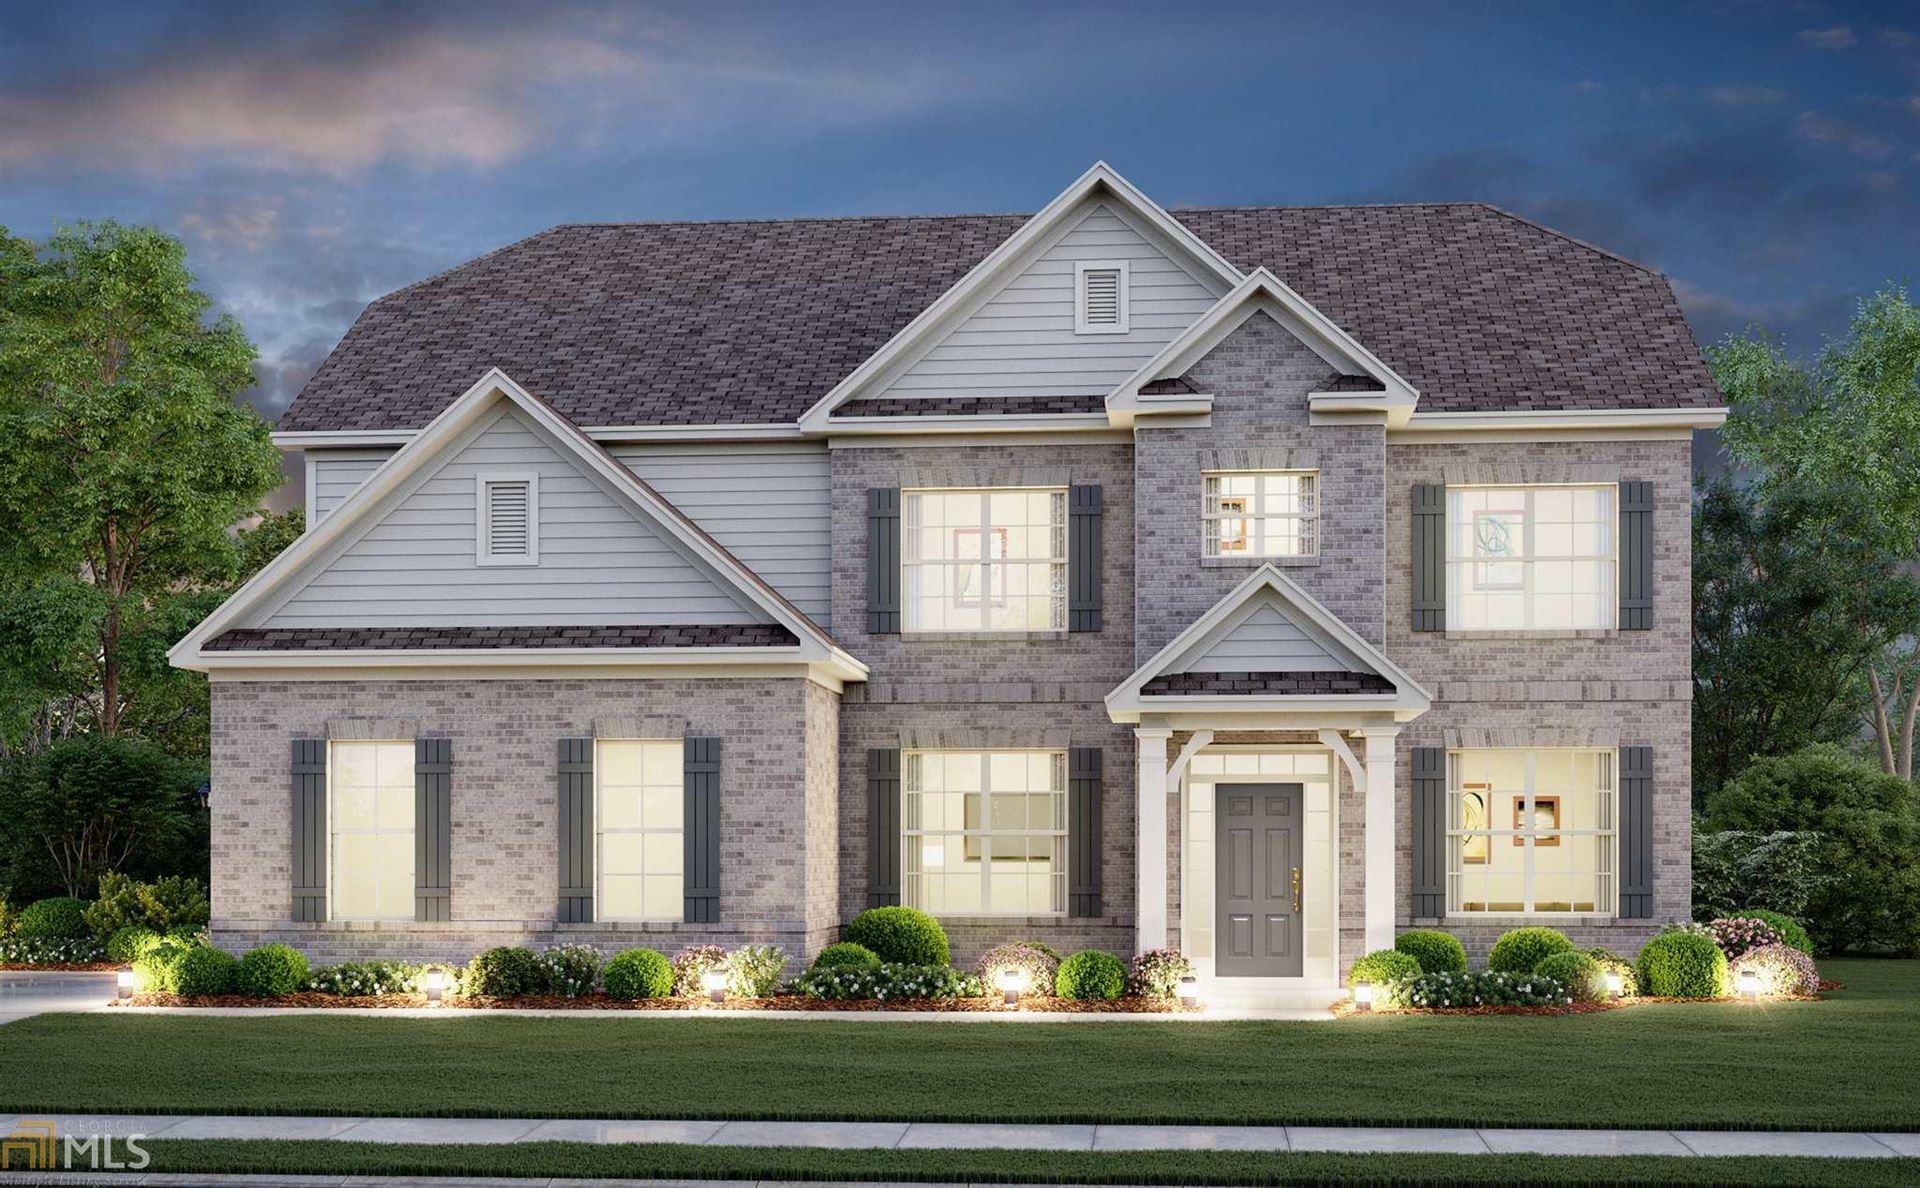 3584 Nathan Farm Ln, Buford, GA 30519 - MLS#: 8912315